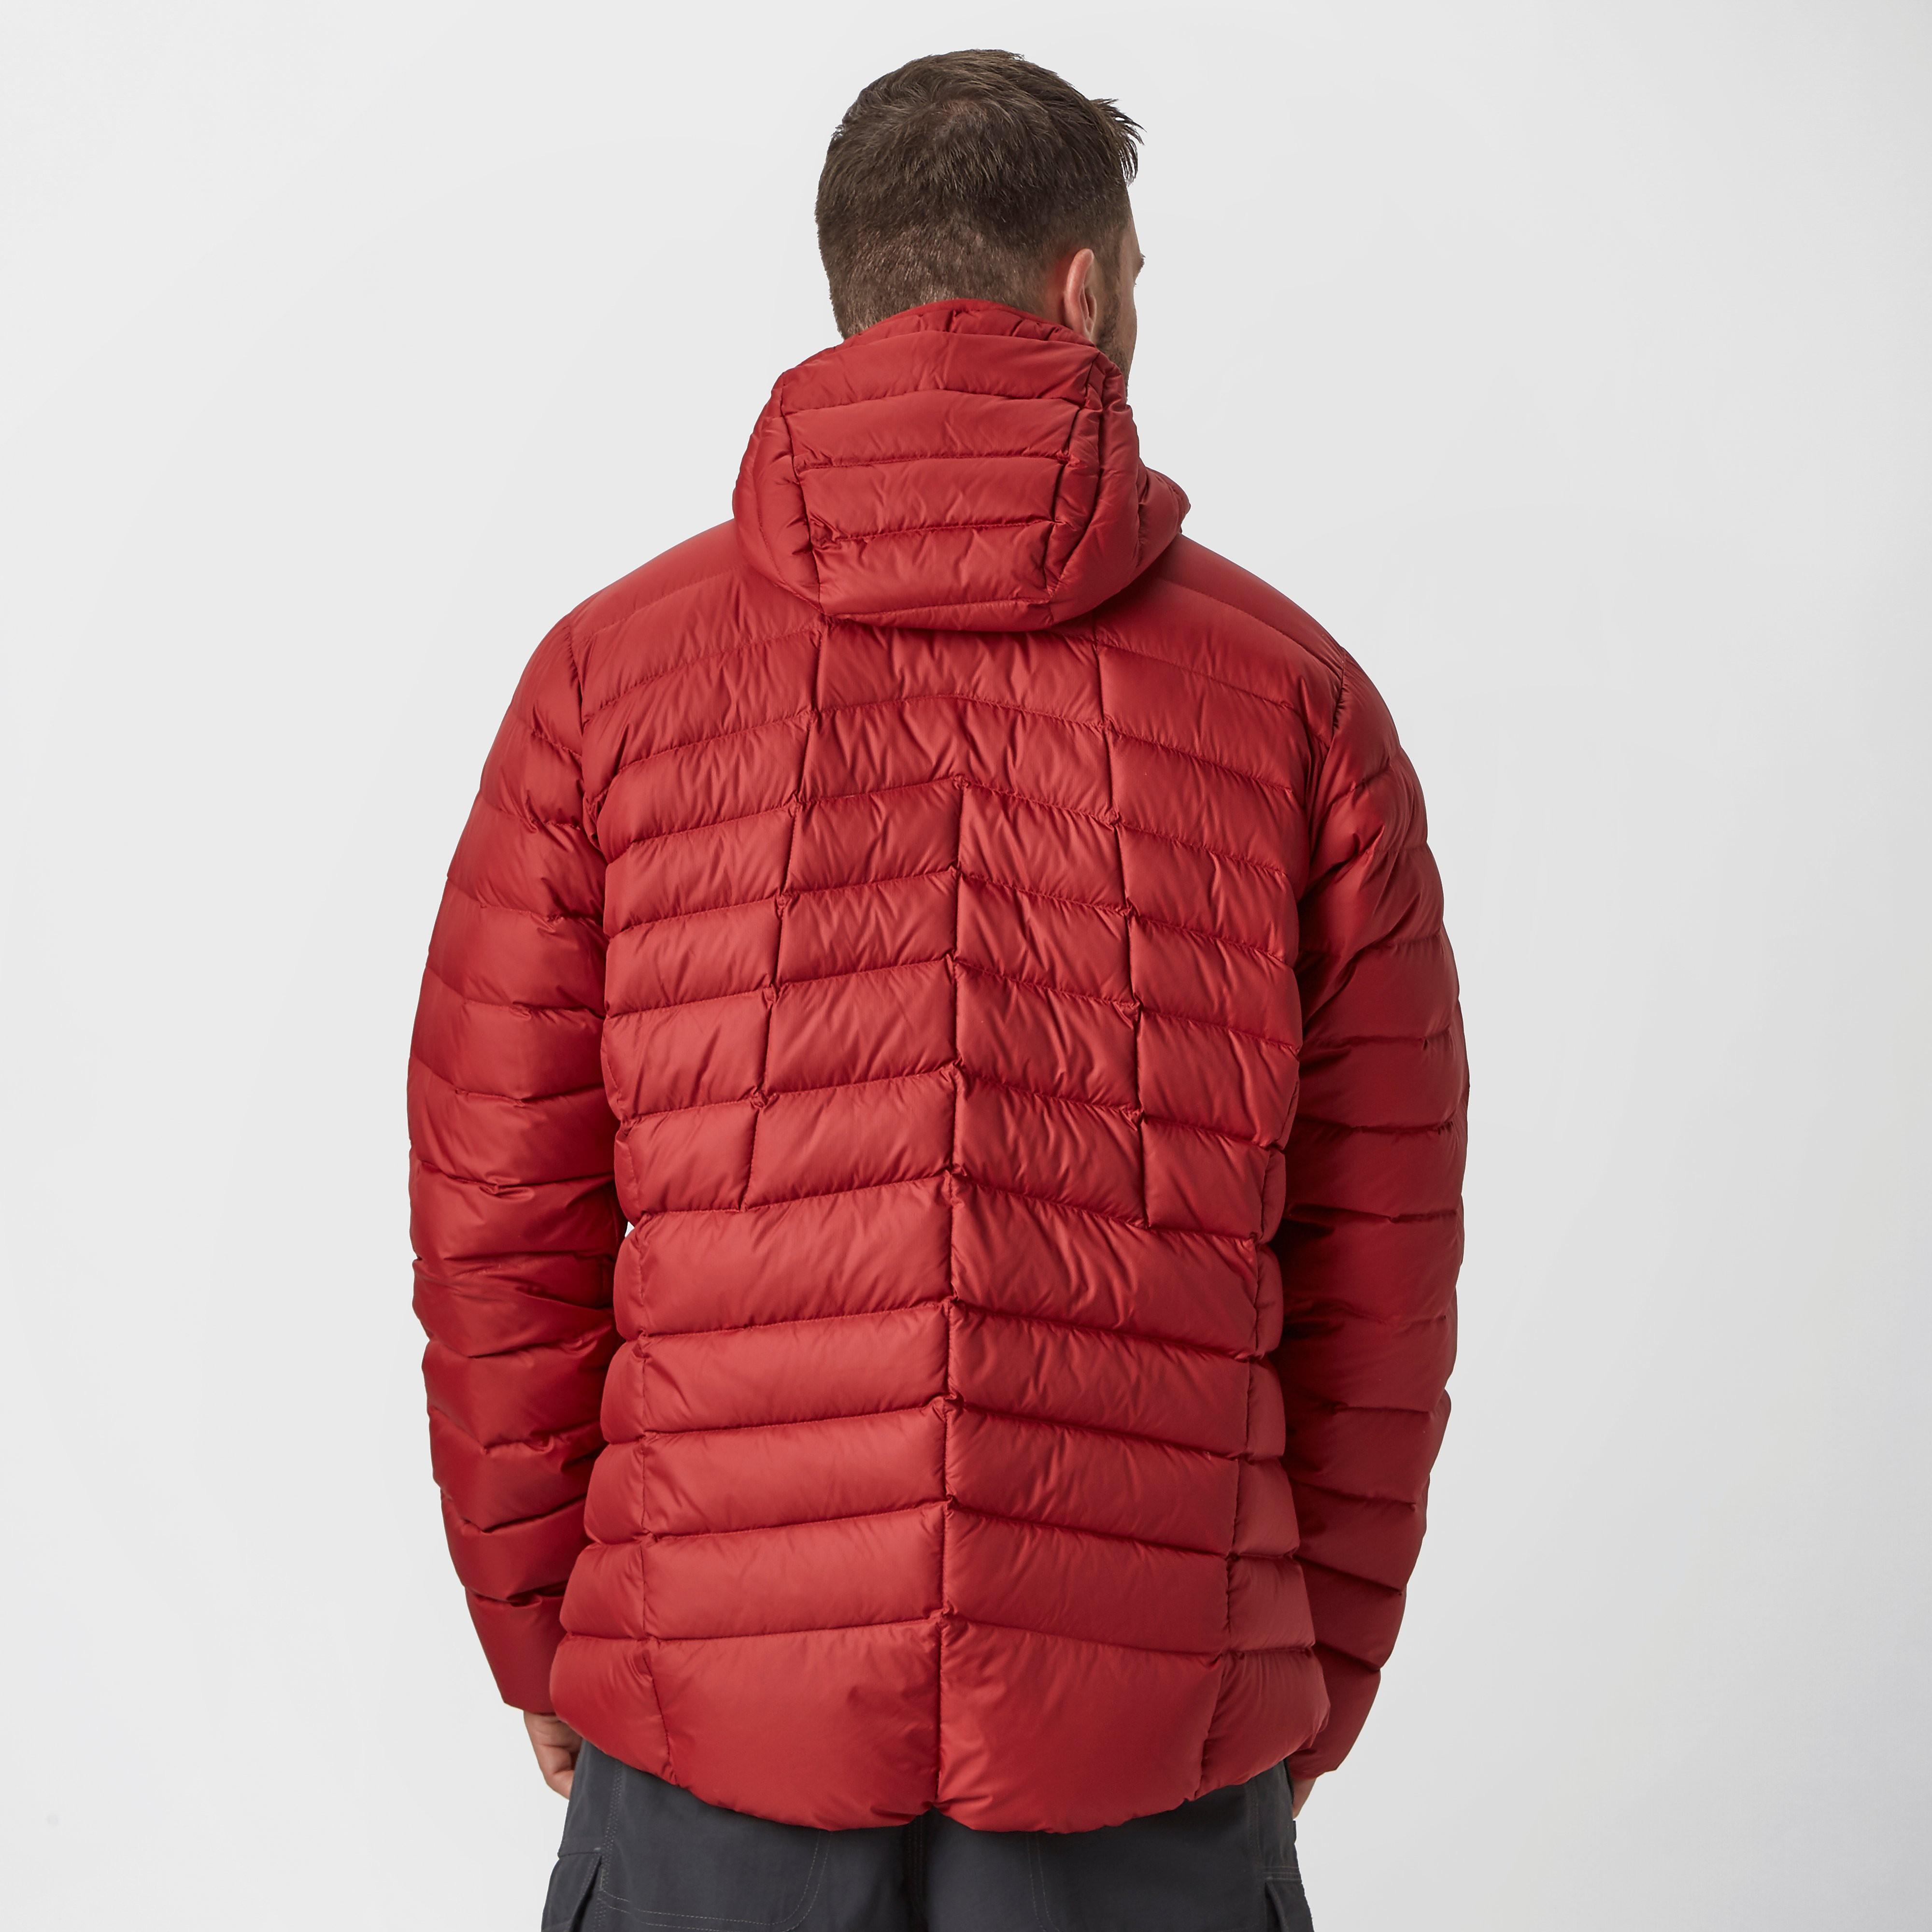 Berghaus Combust Insulated Men's Jacket